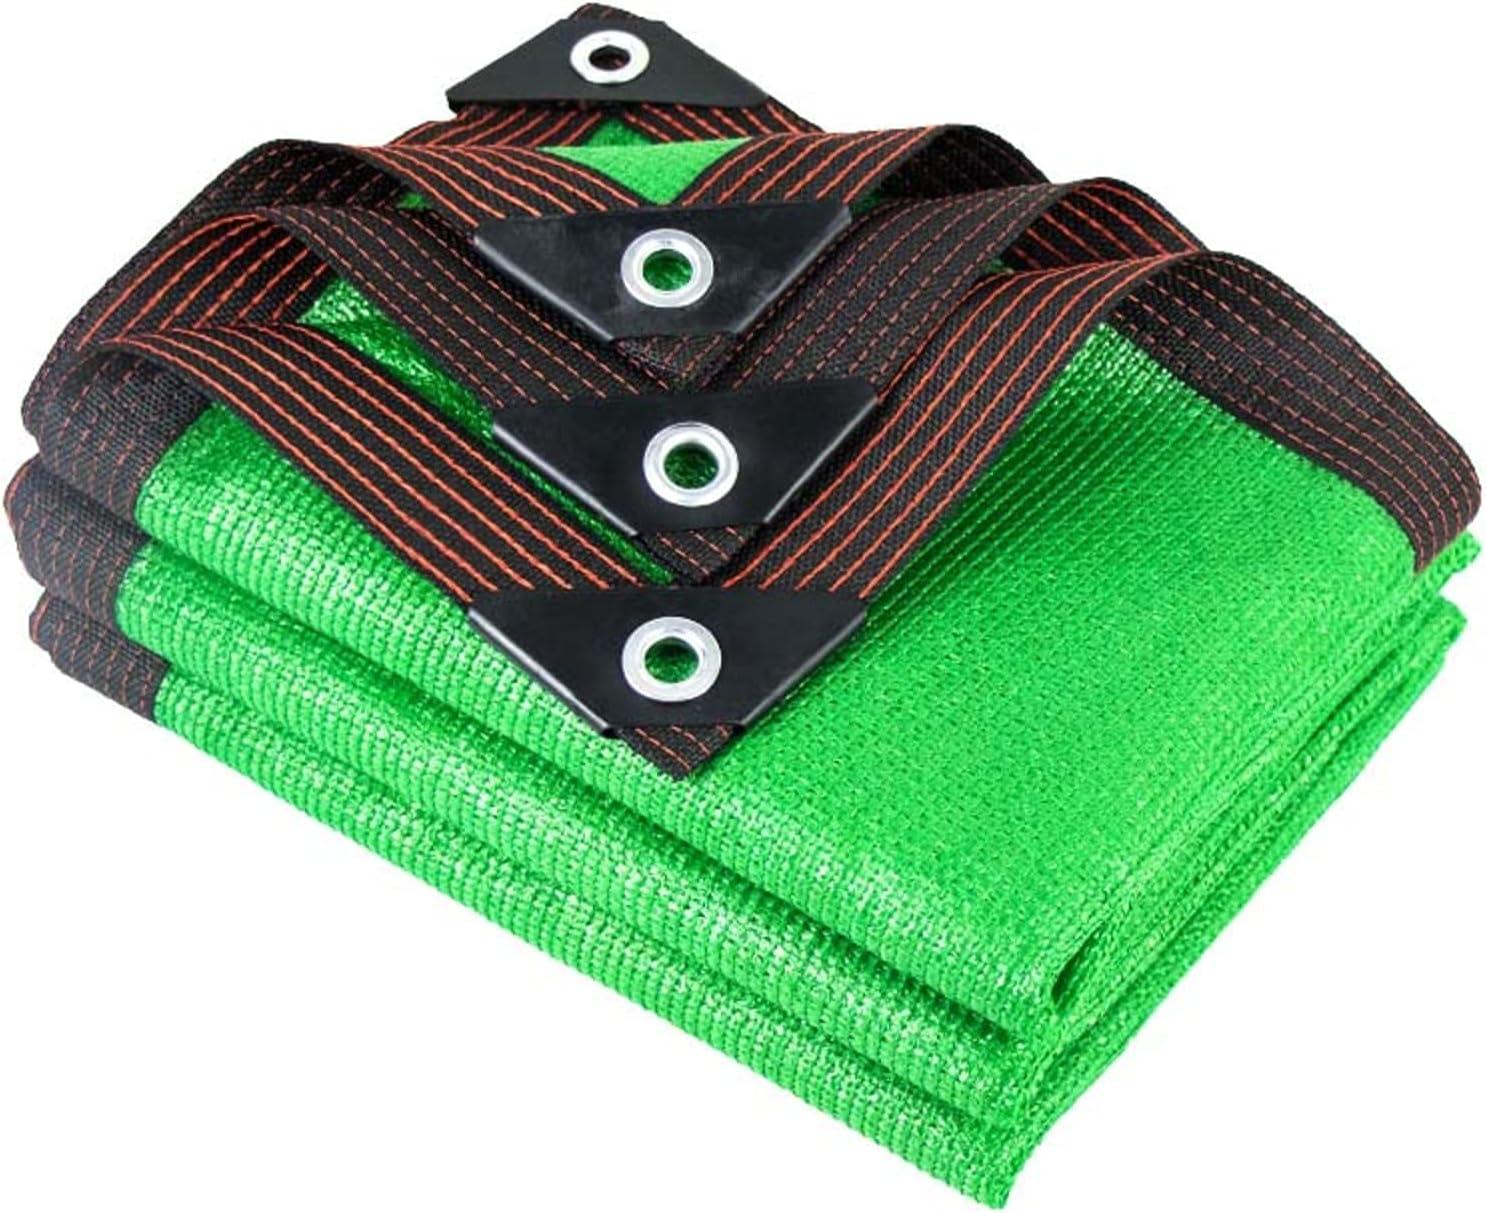 OeltWsoif Sunblock Shade Cloth Low price Garden Mesh Fees free Panel Green Gre